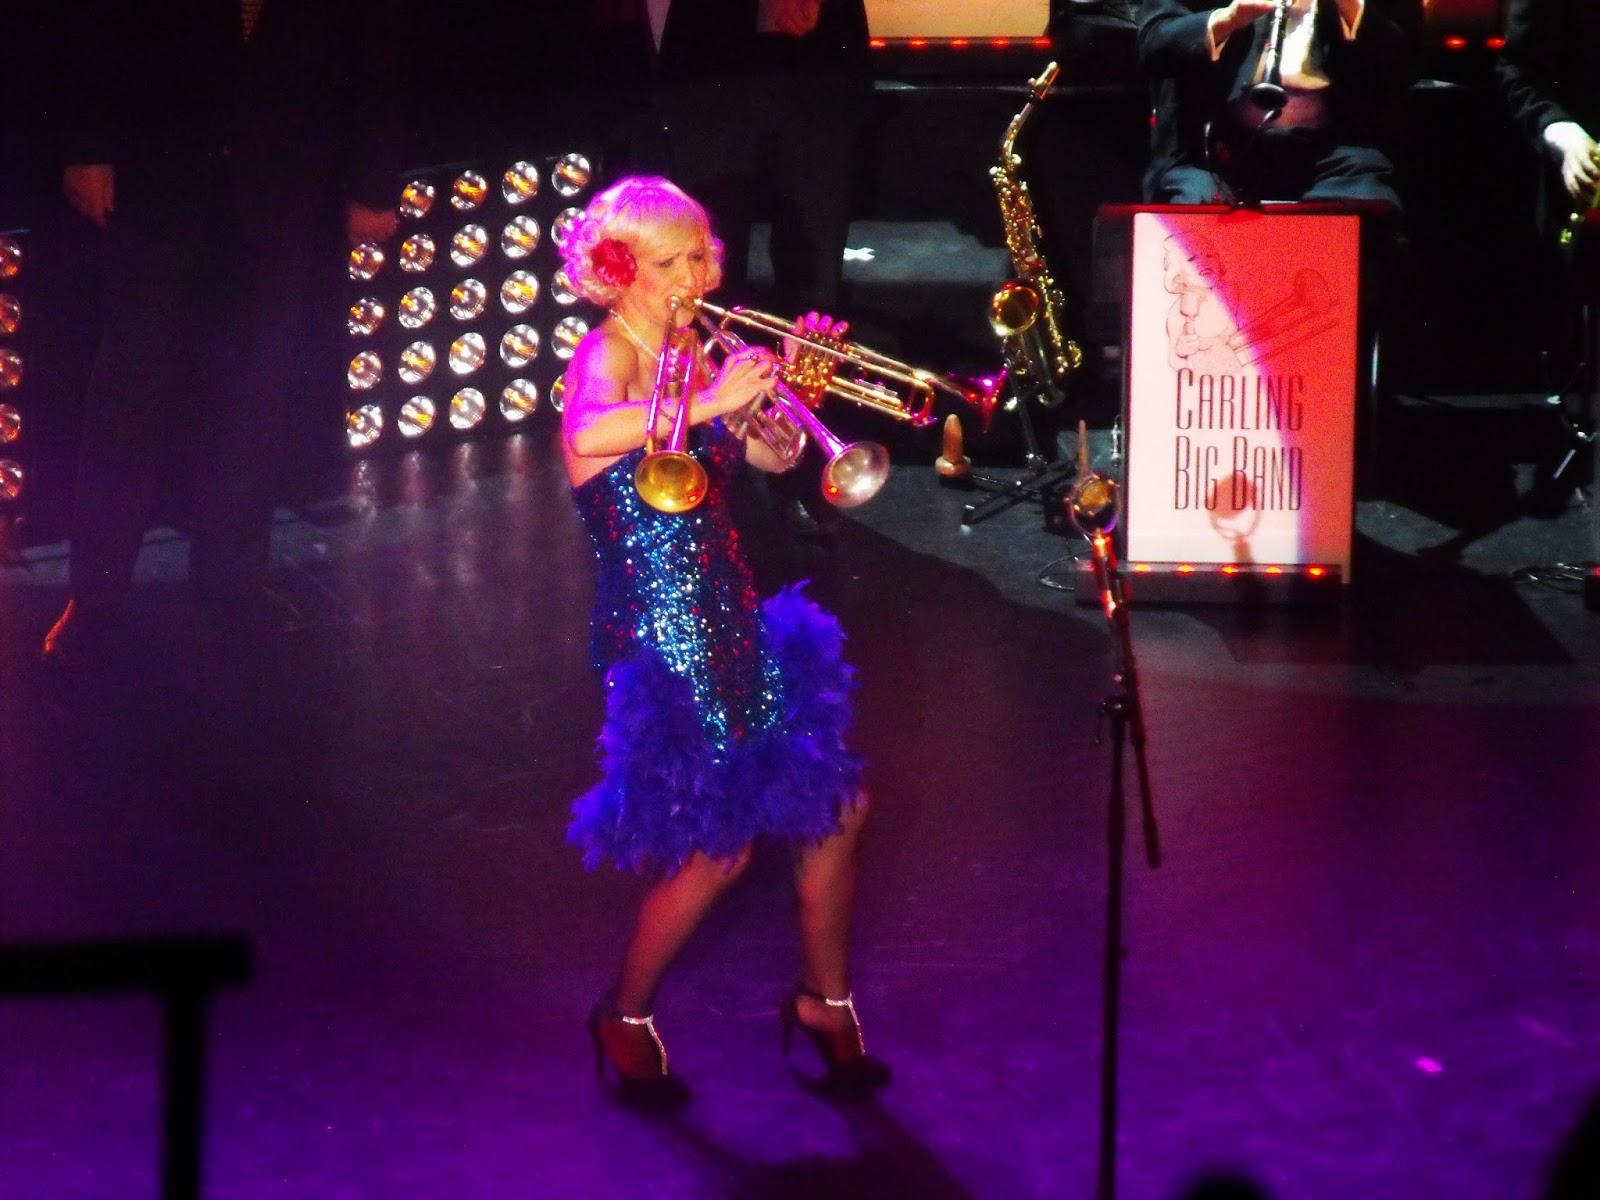 Gunhild Carling, Jazzvarité, Harlem Hot Shots, Swing, Jazz